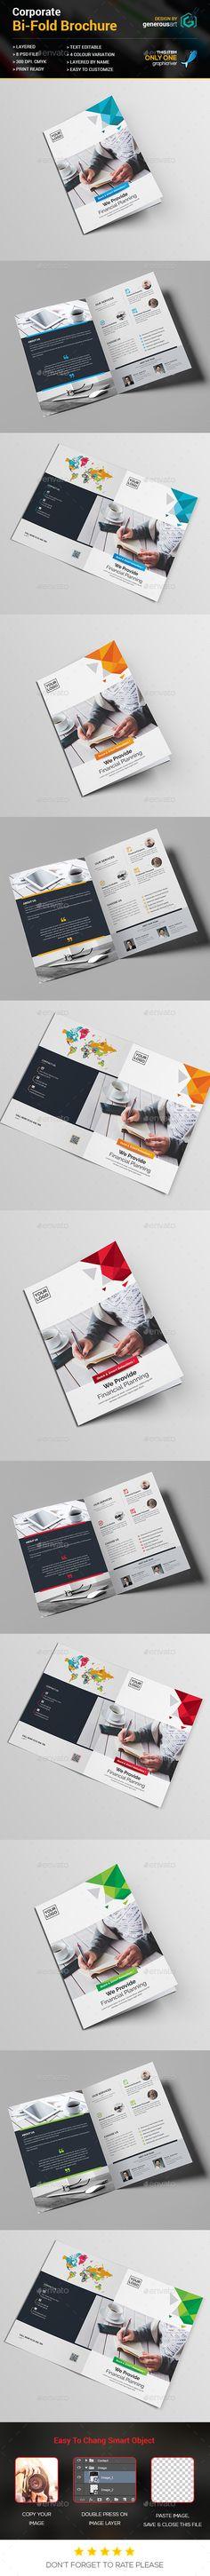 smart fourtwo Smart cars Pinterest - half fold brochure template